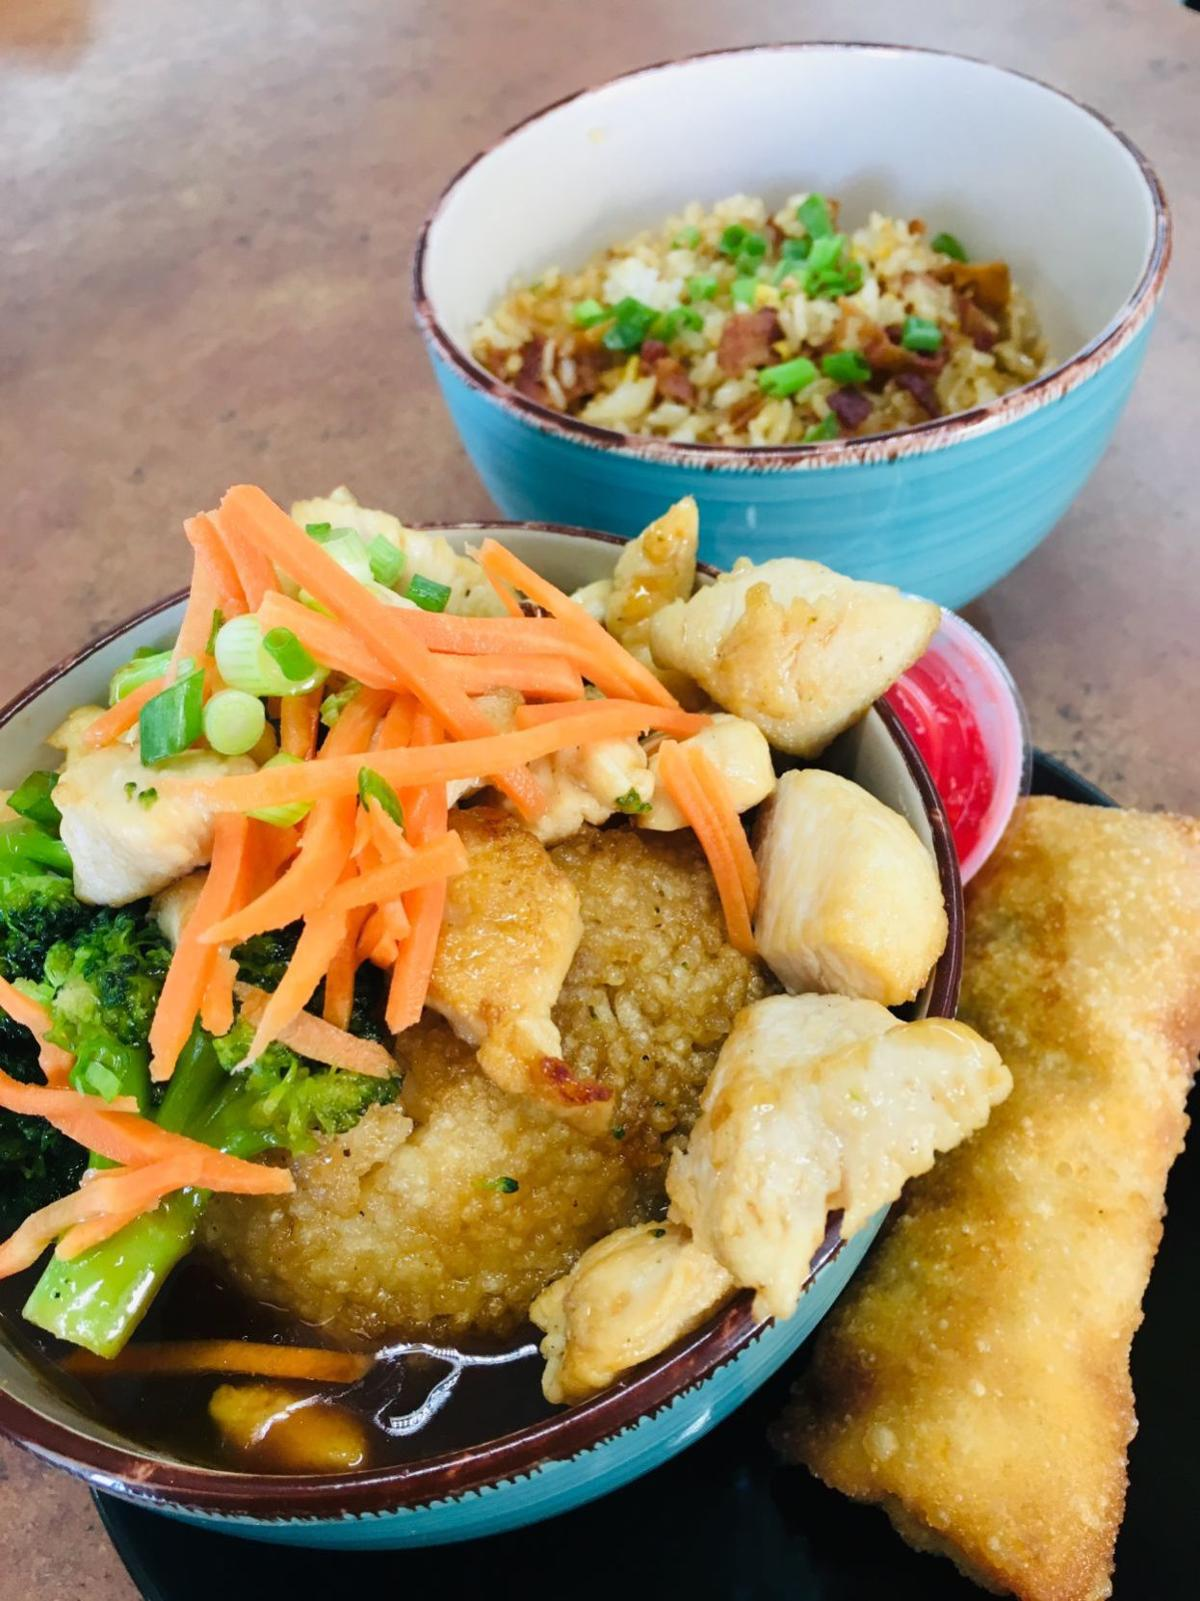 20191106-gm-food-Shima's Hiroshima, bacon-fried rice and egg roll3.JPG